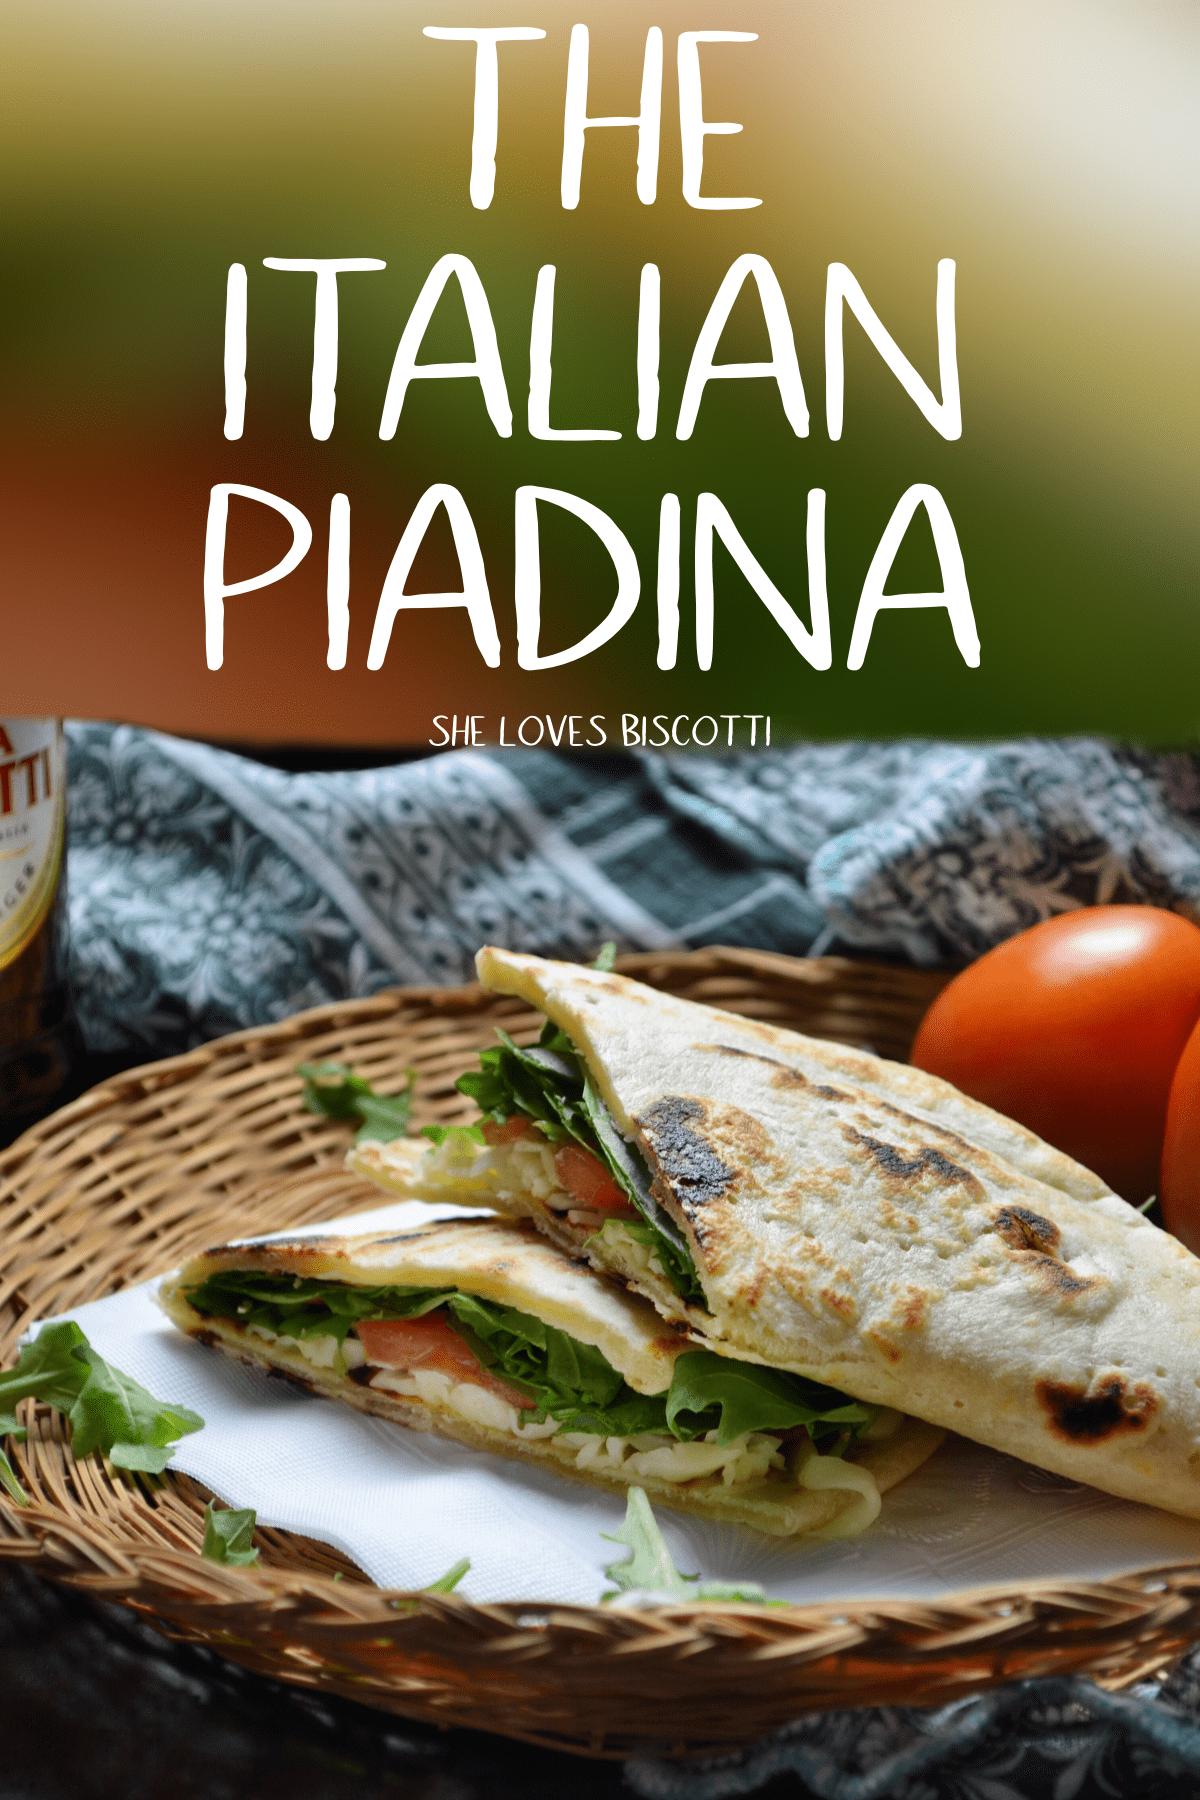 Italian Piadina || Italian flatbread || Vegetarian Piadina || Italian Piadina recipe #piadina #italianflatbread #flatbread #homemadeflatbread #italianrecipes #streetfood #appetizer #emiliaromagna #italianfood